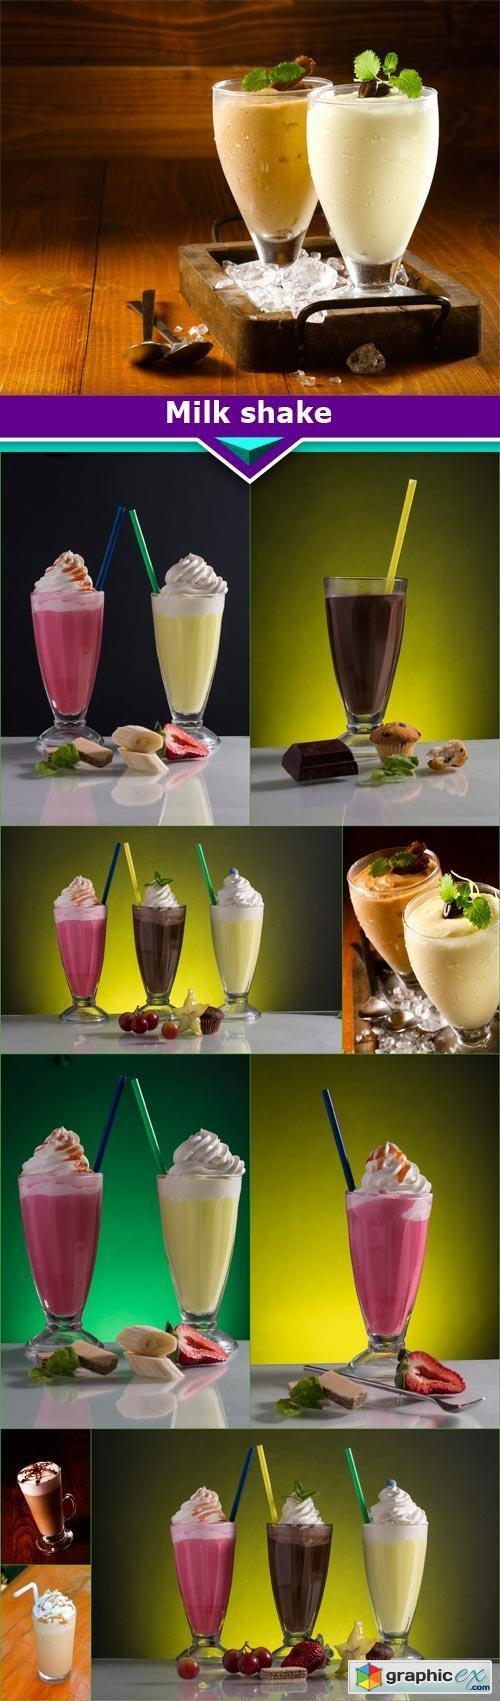 Milk shake 10x JPEG » Free Download Vector Stock Image